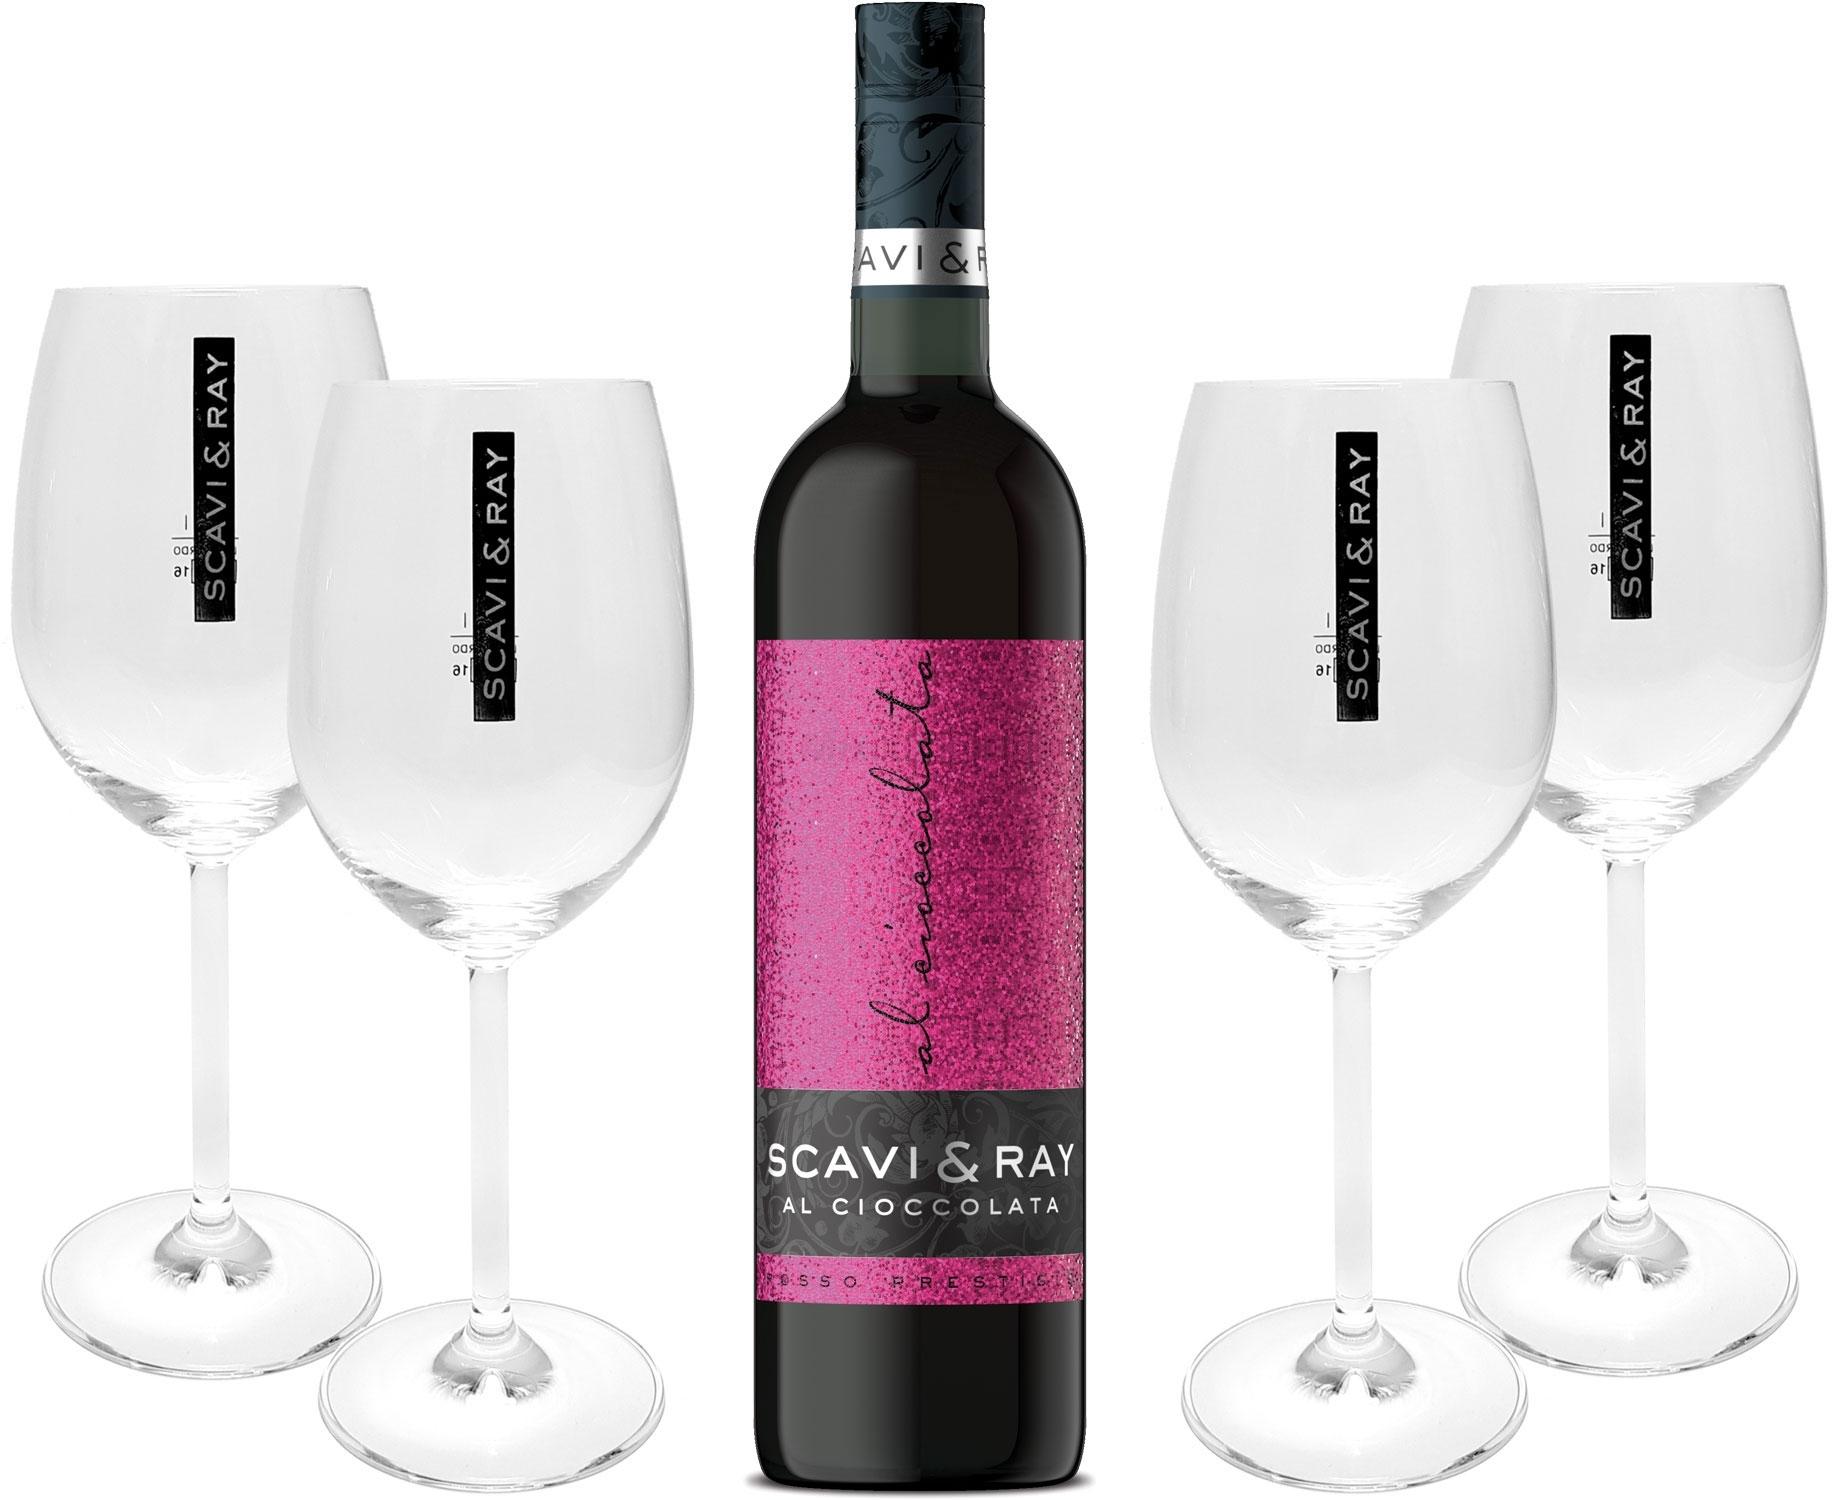 Scavi & Ray Al Cioccolata Rotwein Cuvèe 0,75l (10% Vol) + 4x Ballon Gläser (20cl) -[Enthält Sulfite]